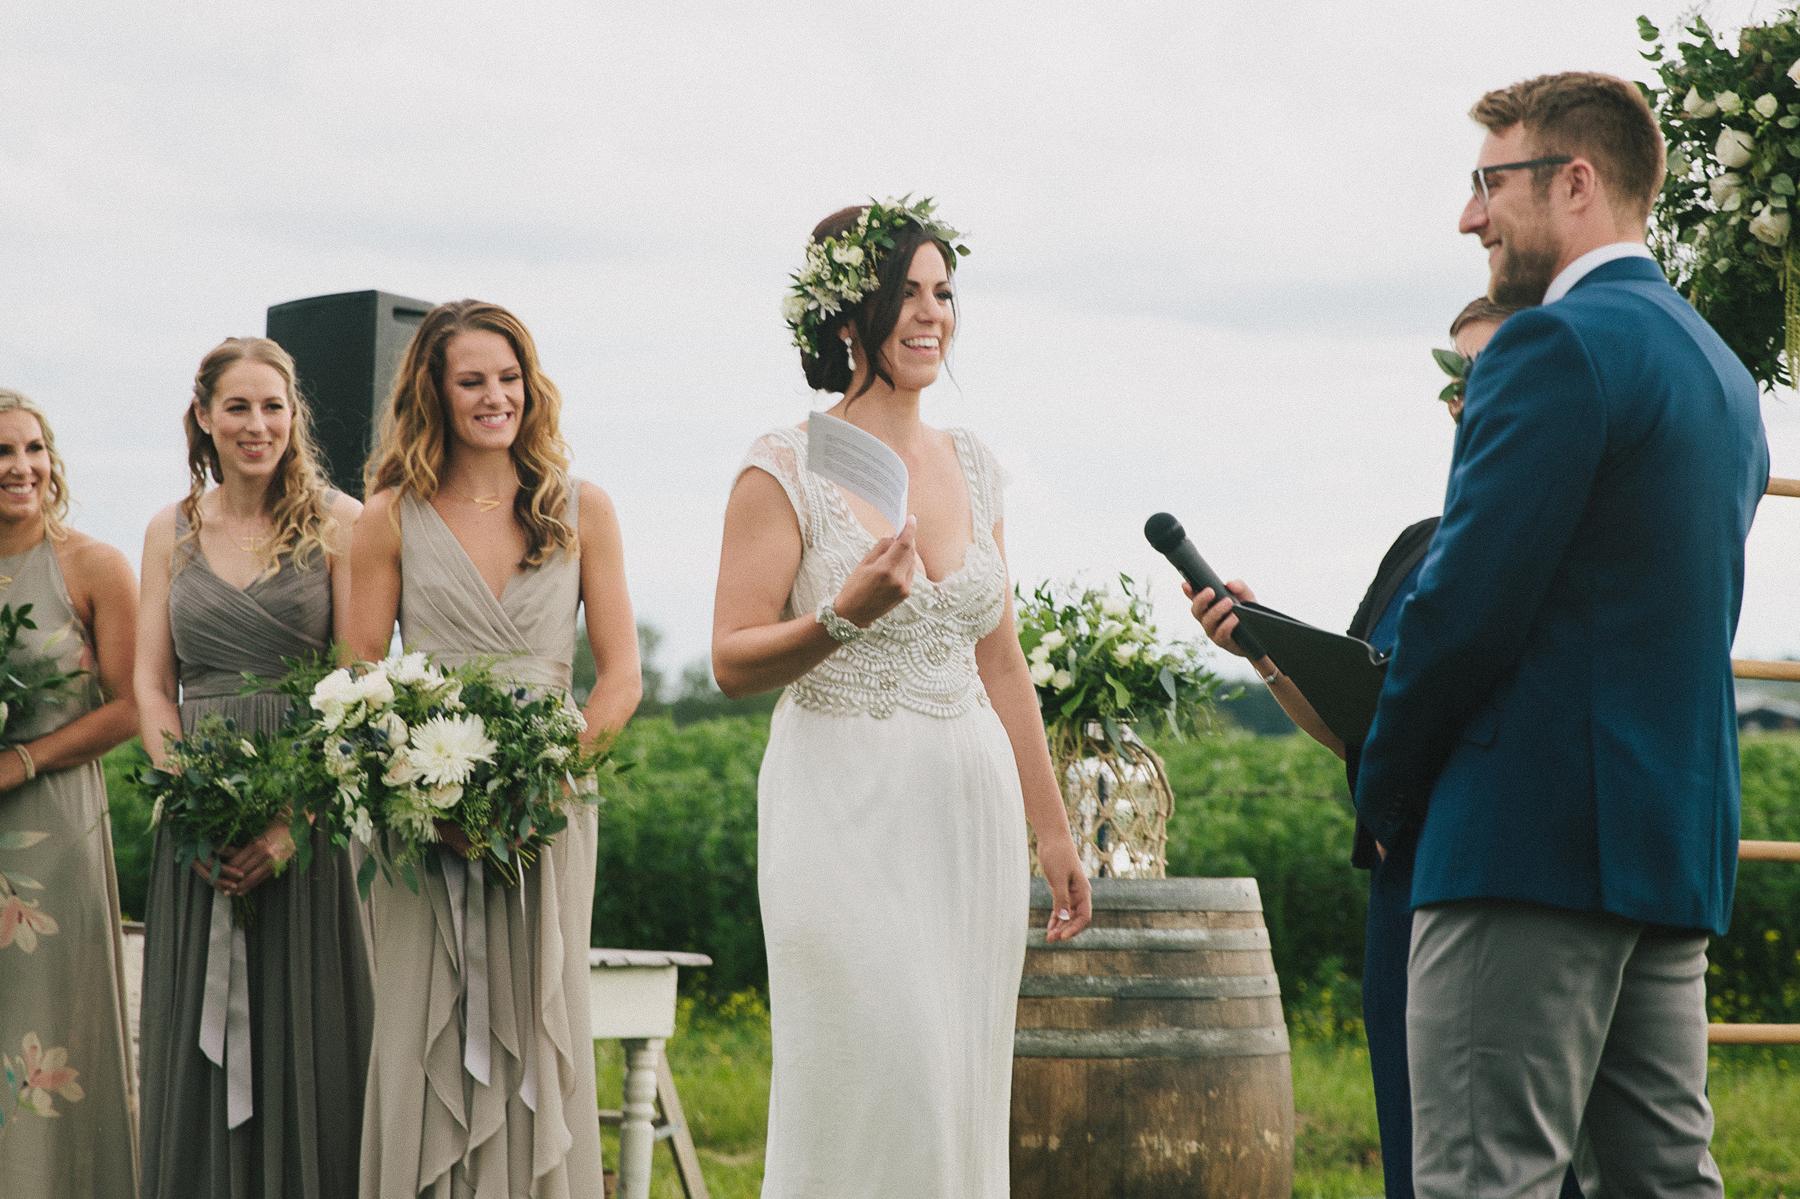 alberta-farm-wedding-photographer-rp-wj-133.jpg